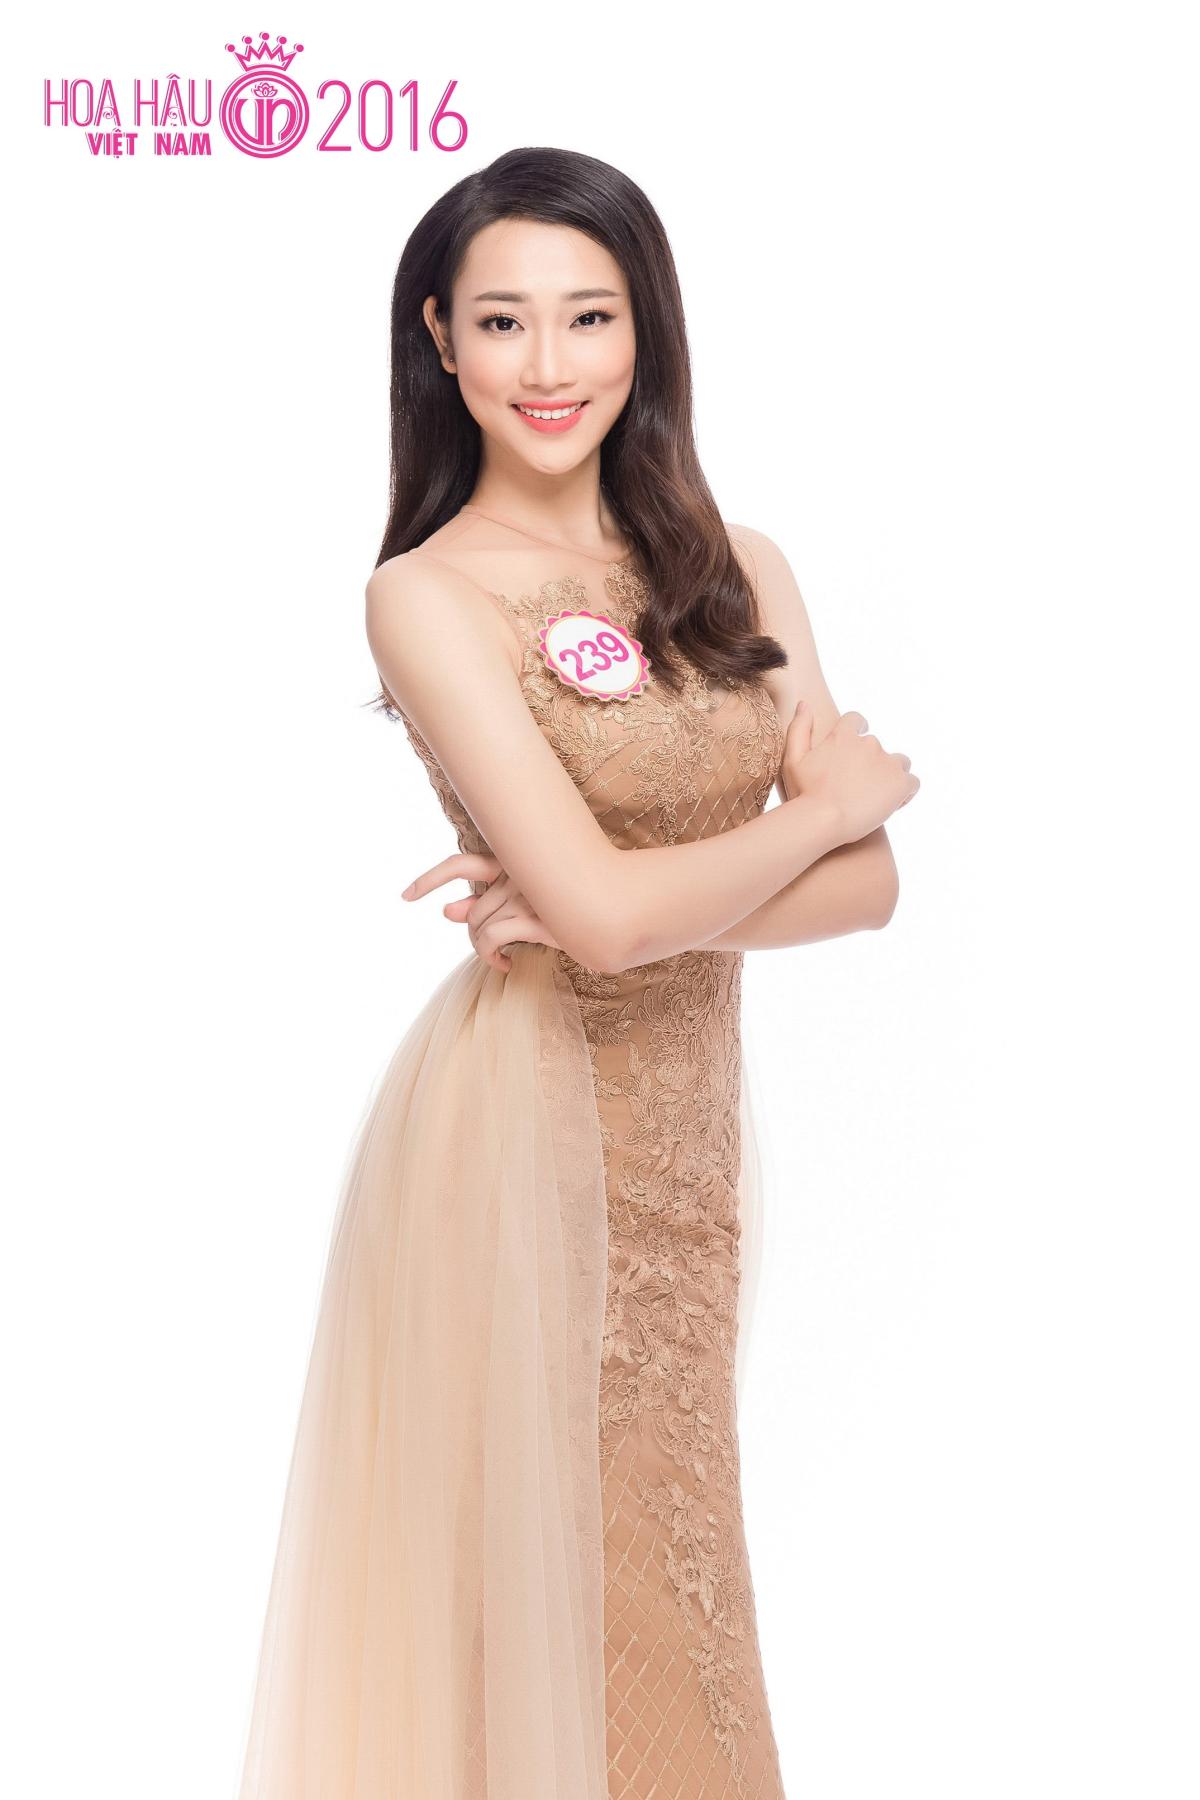 9 - Pham Thuy Tien